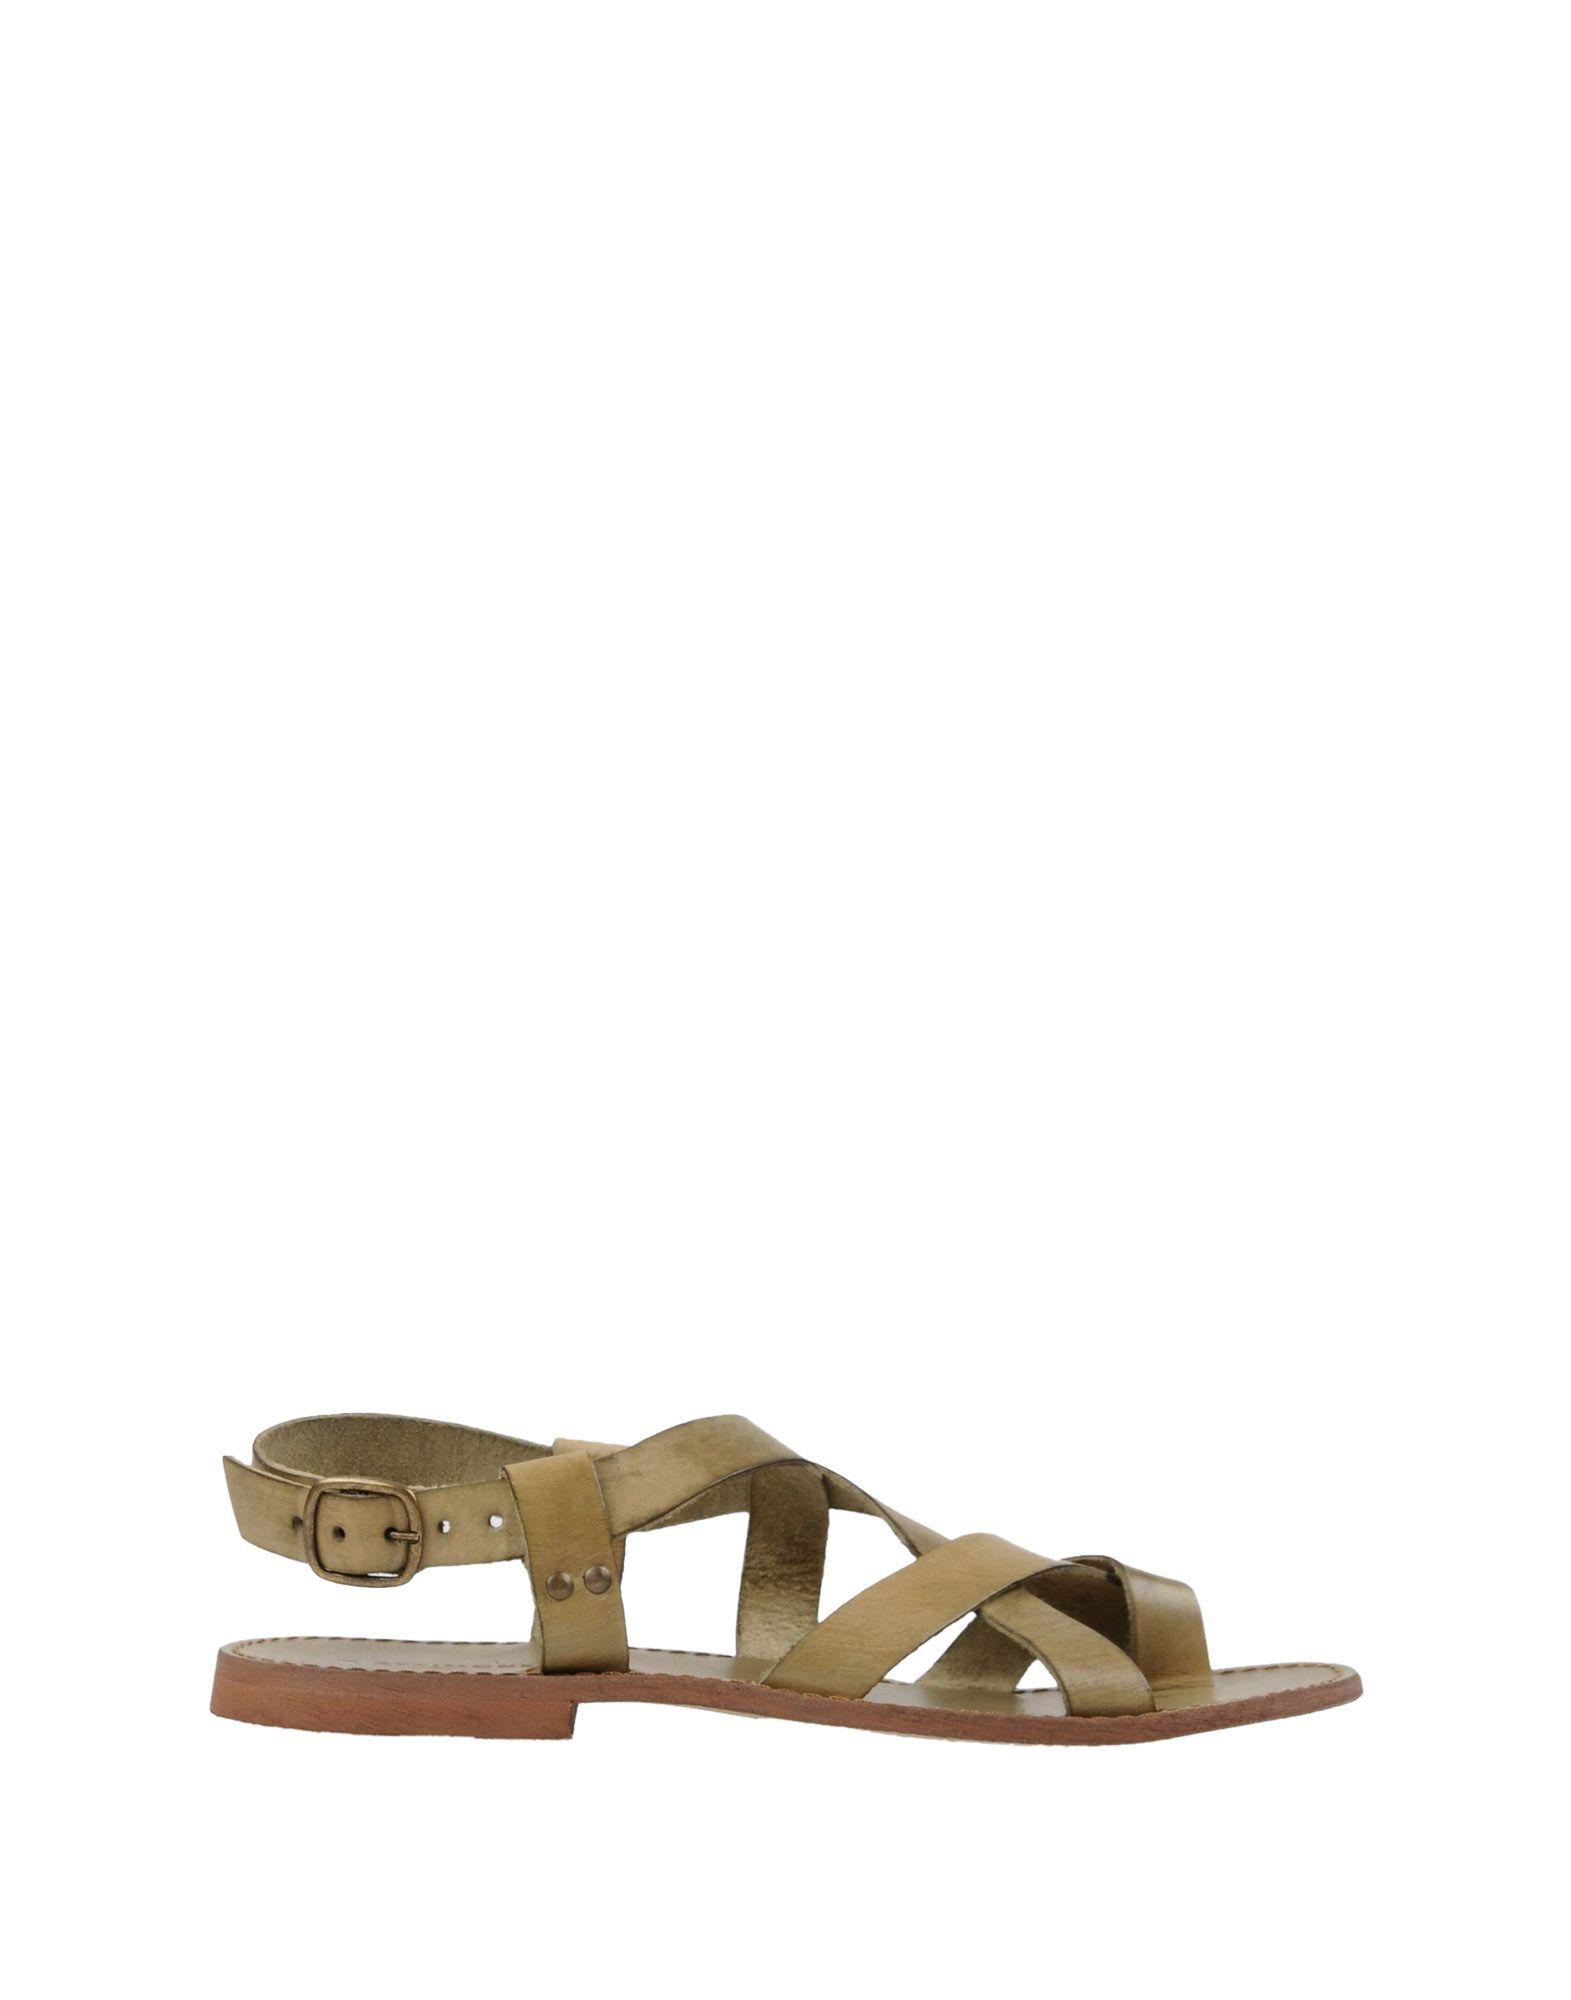 Rabatt echte  Schuhe Attimonelli's Dianetten Herren  echte 11269883DC d6489a